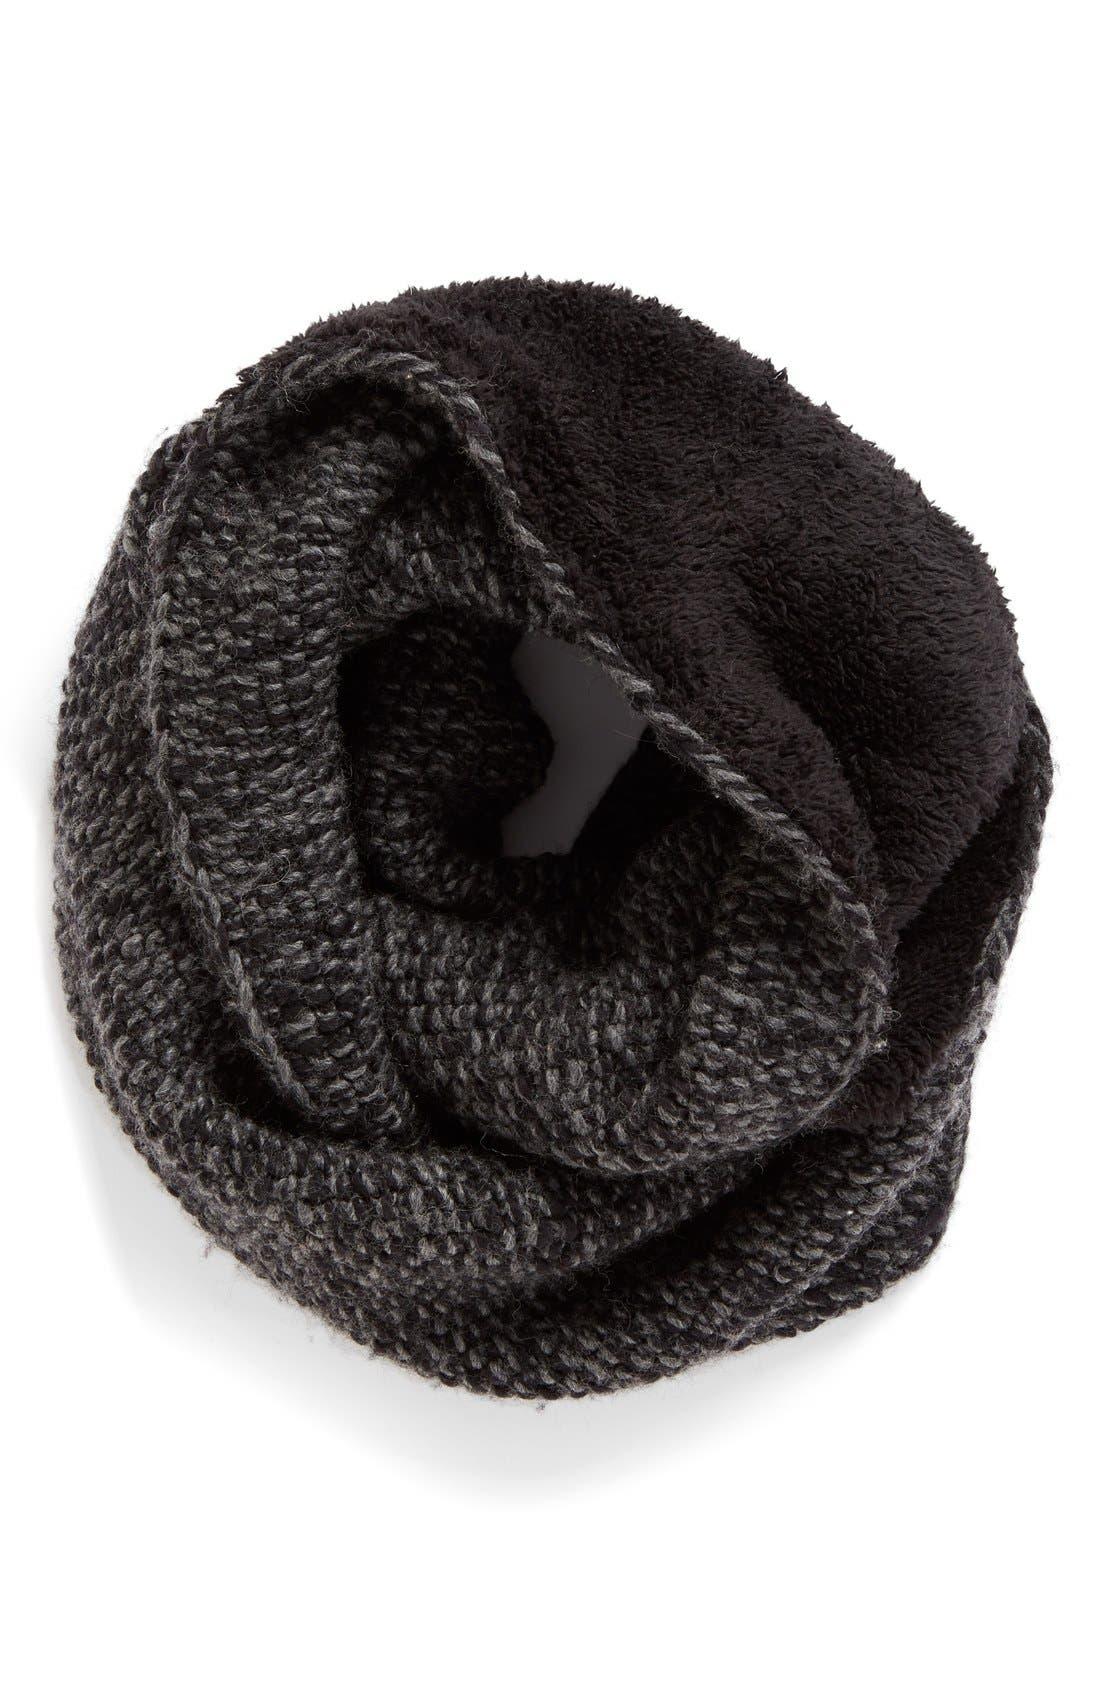 Main Image - Nirvanna Designs Knit Wool Infinity Scarf